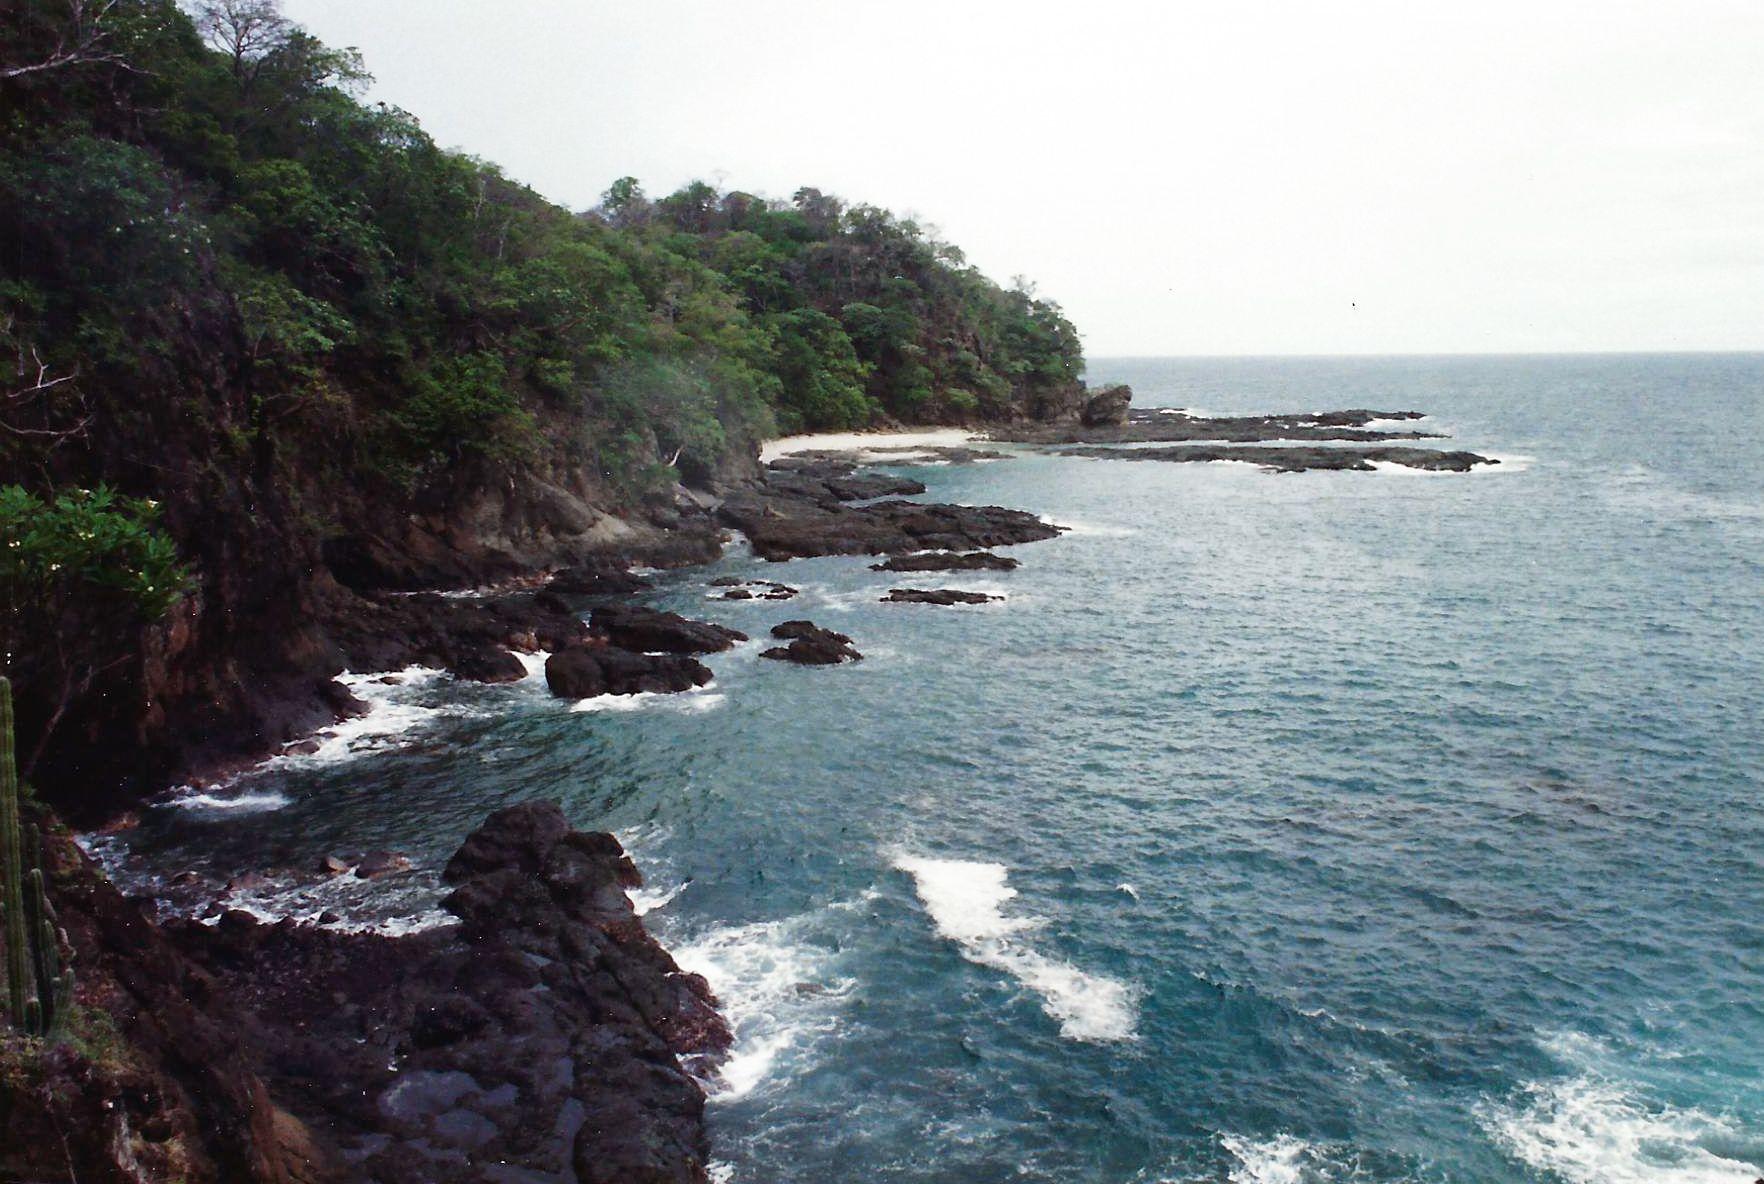 North Pacific Ocean off of Costa Rica